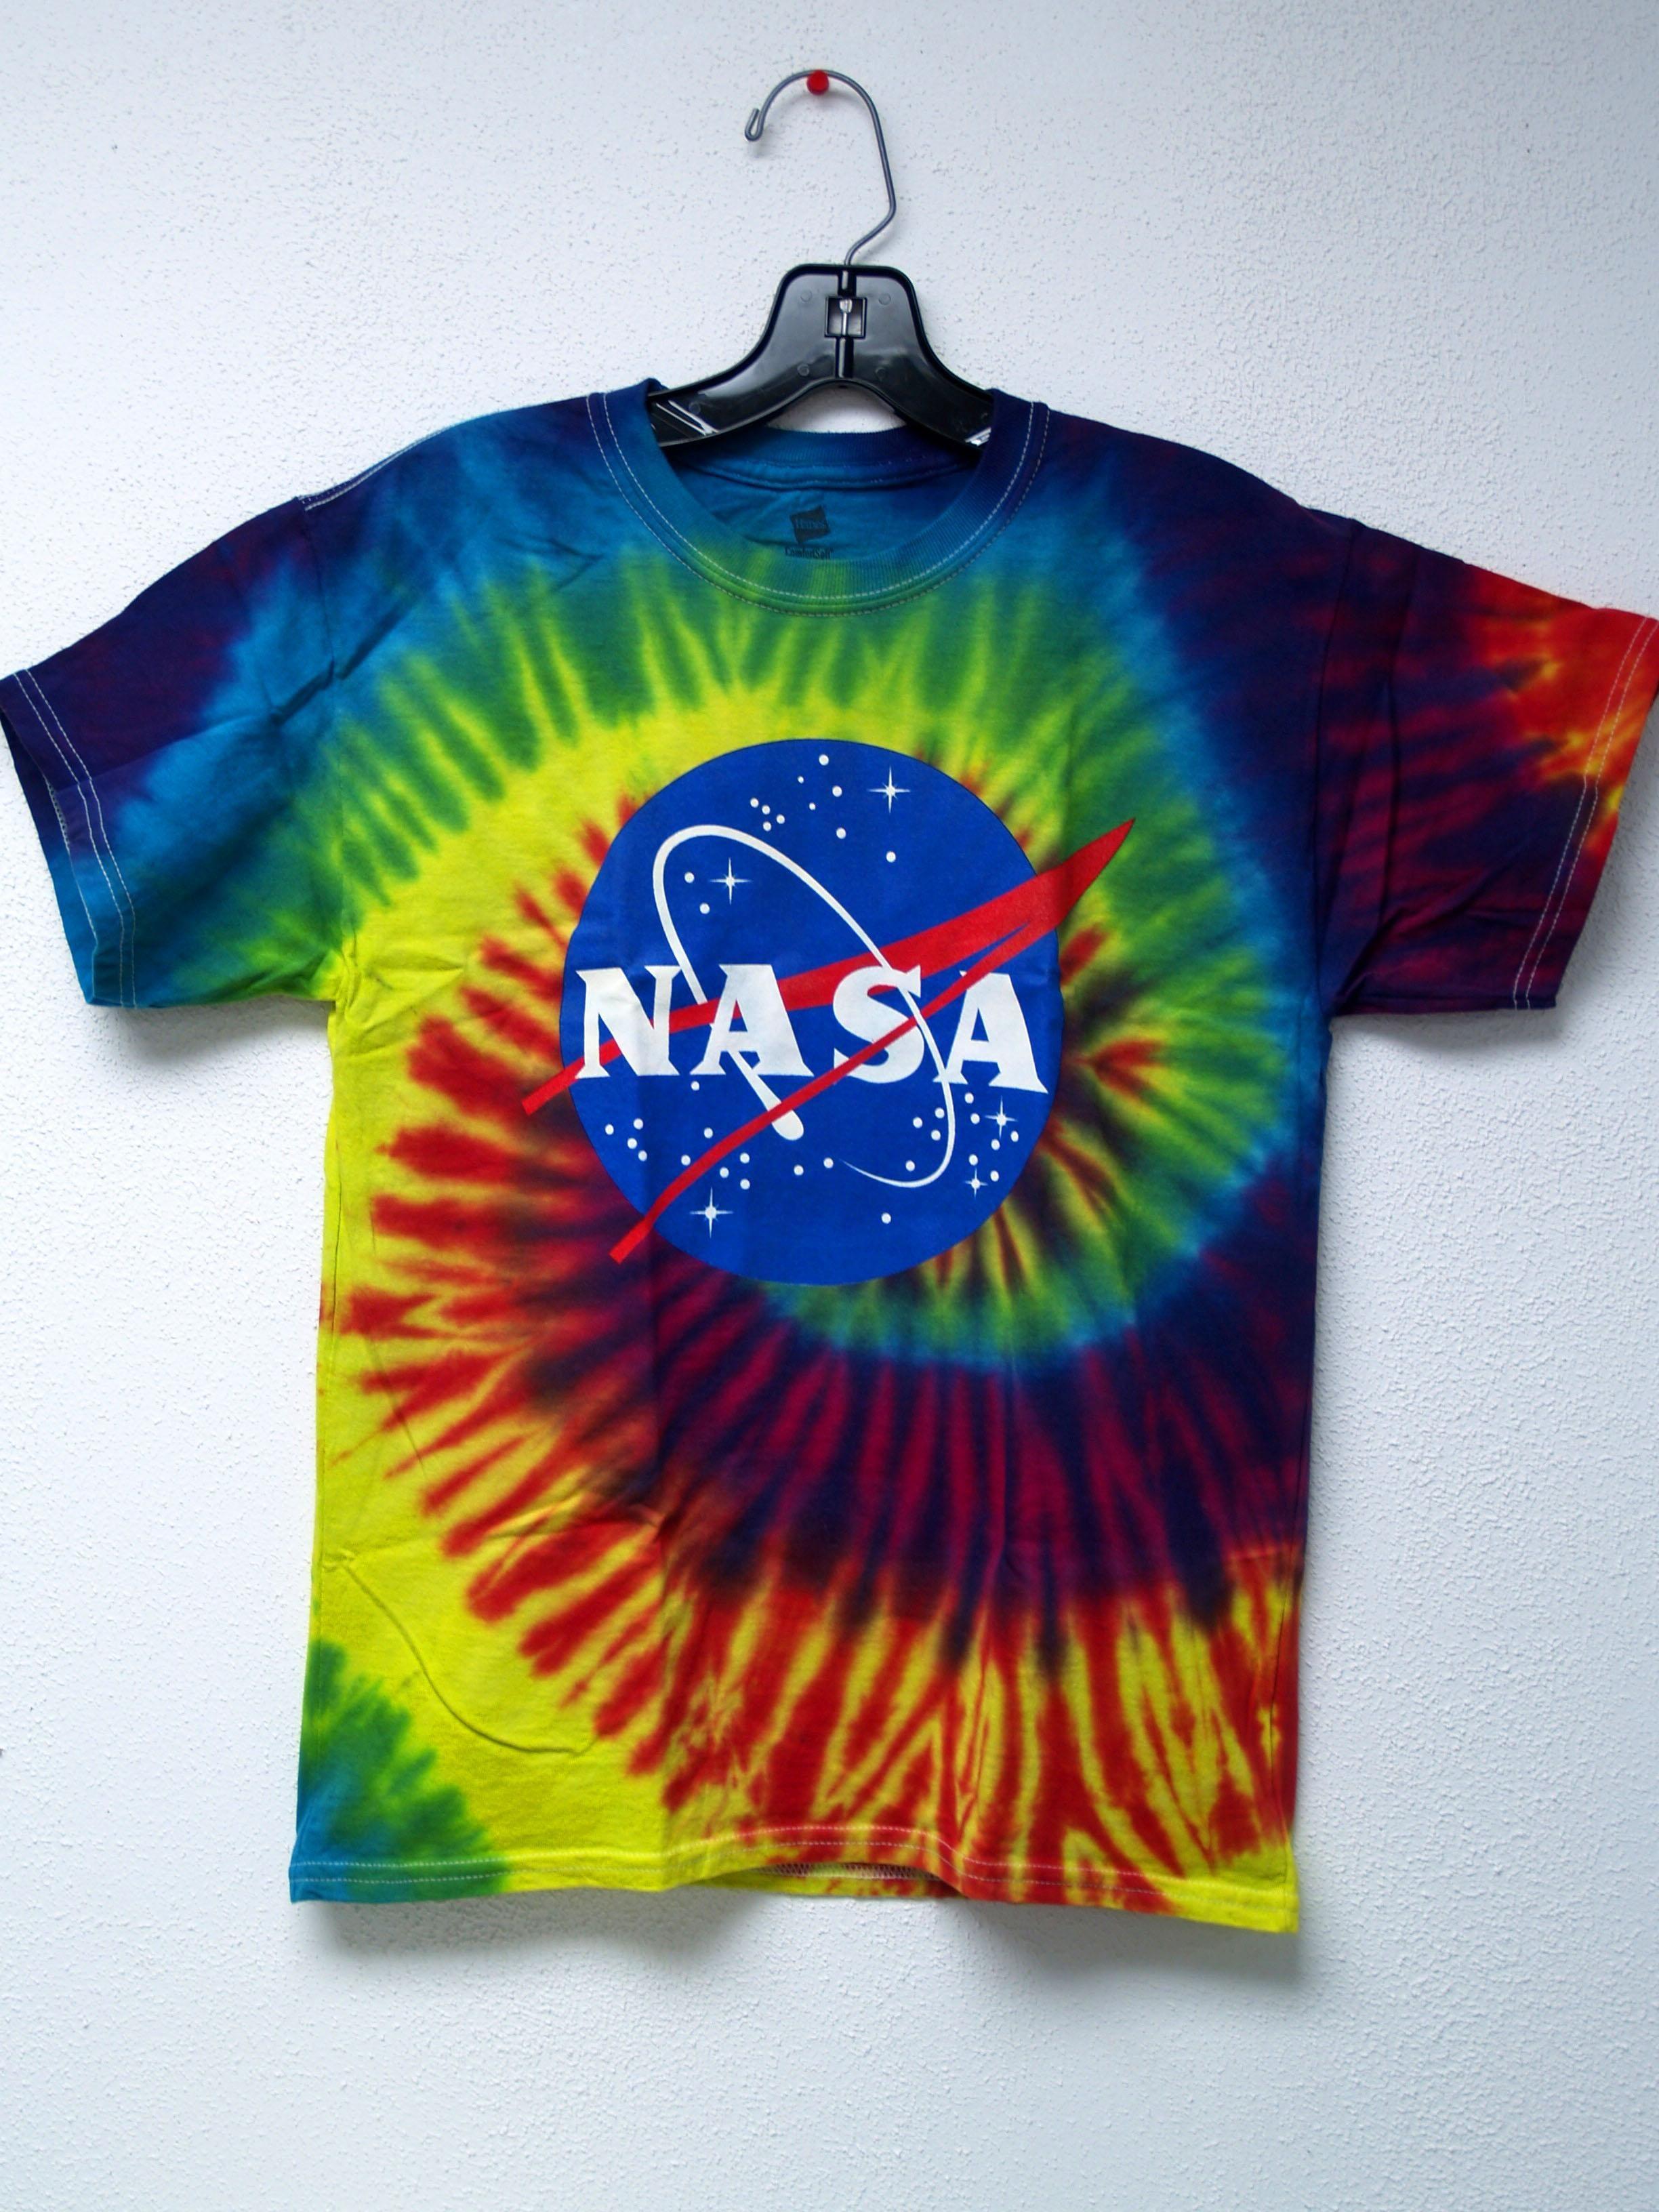 e88b2b52 The classic NASA